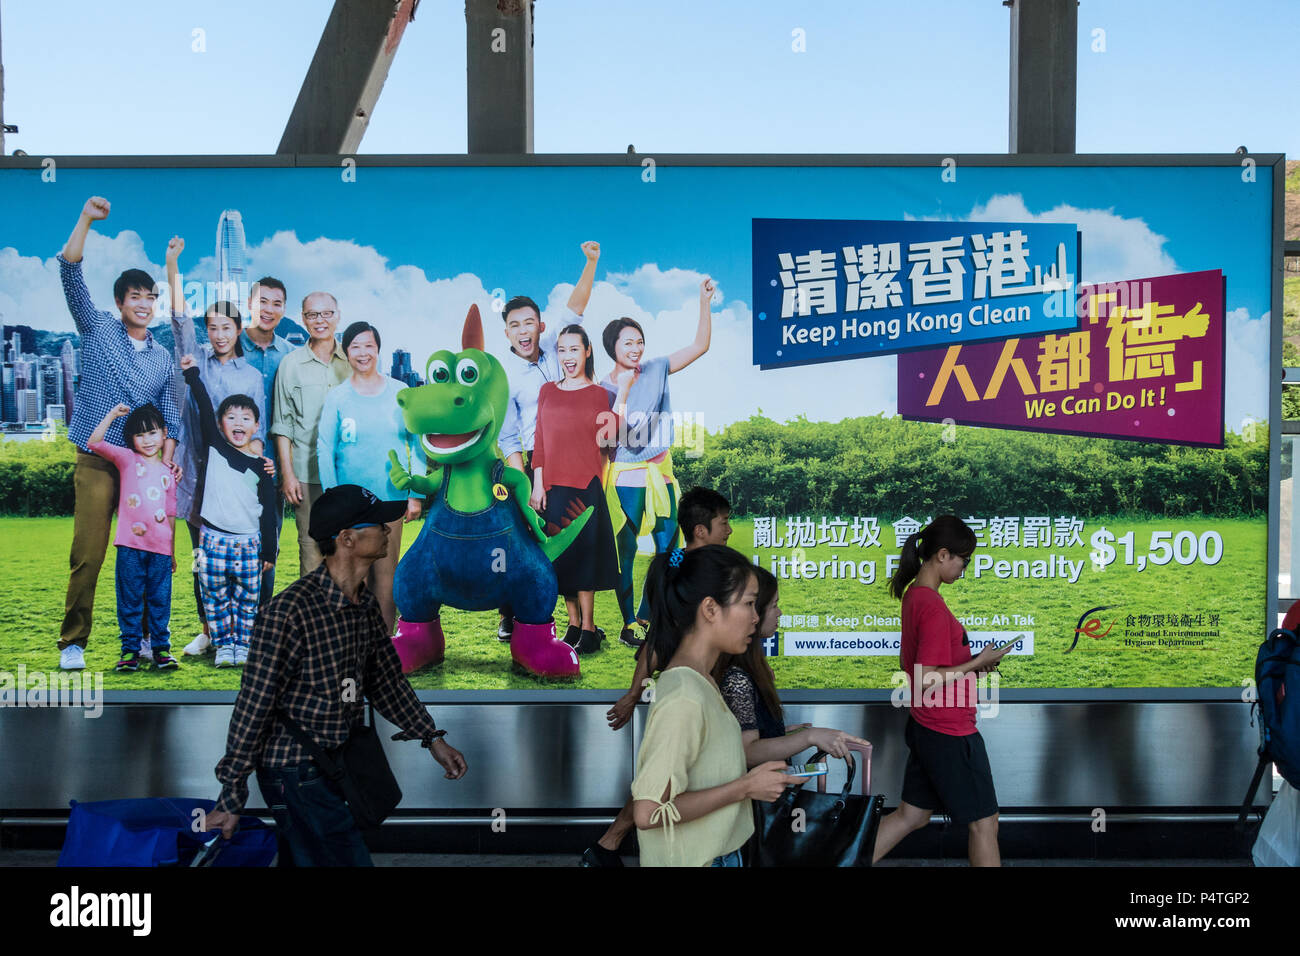 Anti-litter public awareness poster in Hong Kong SAR China - Stock Image